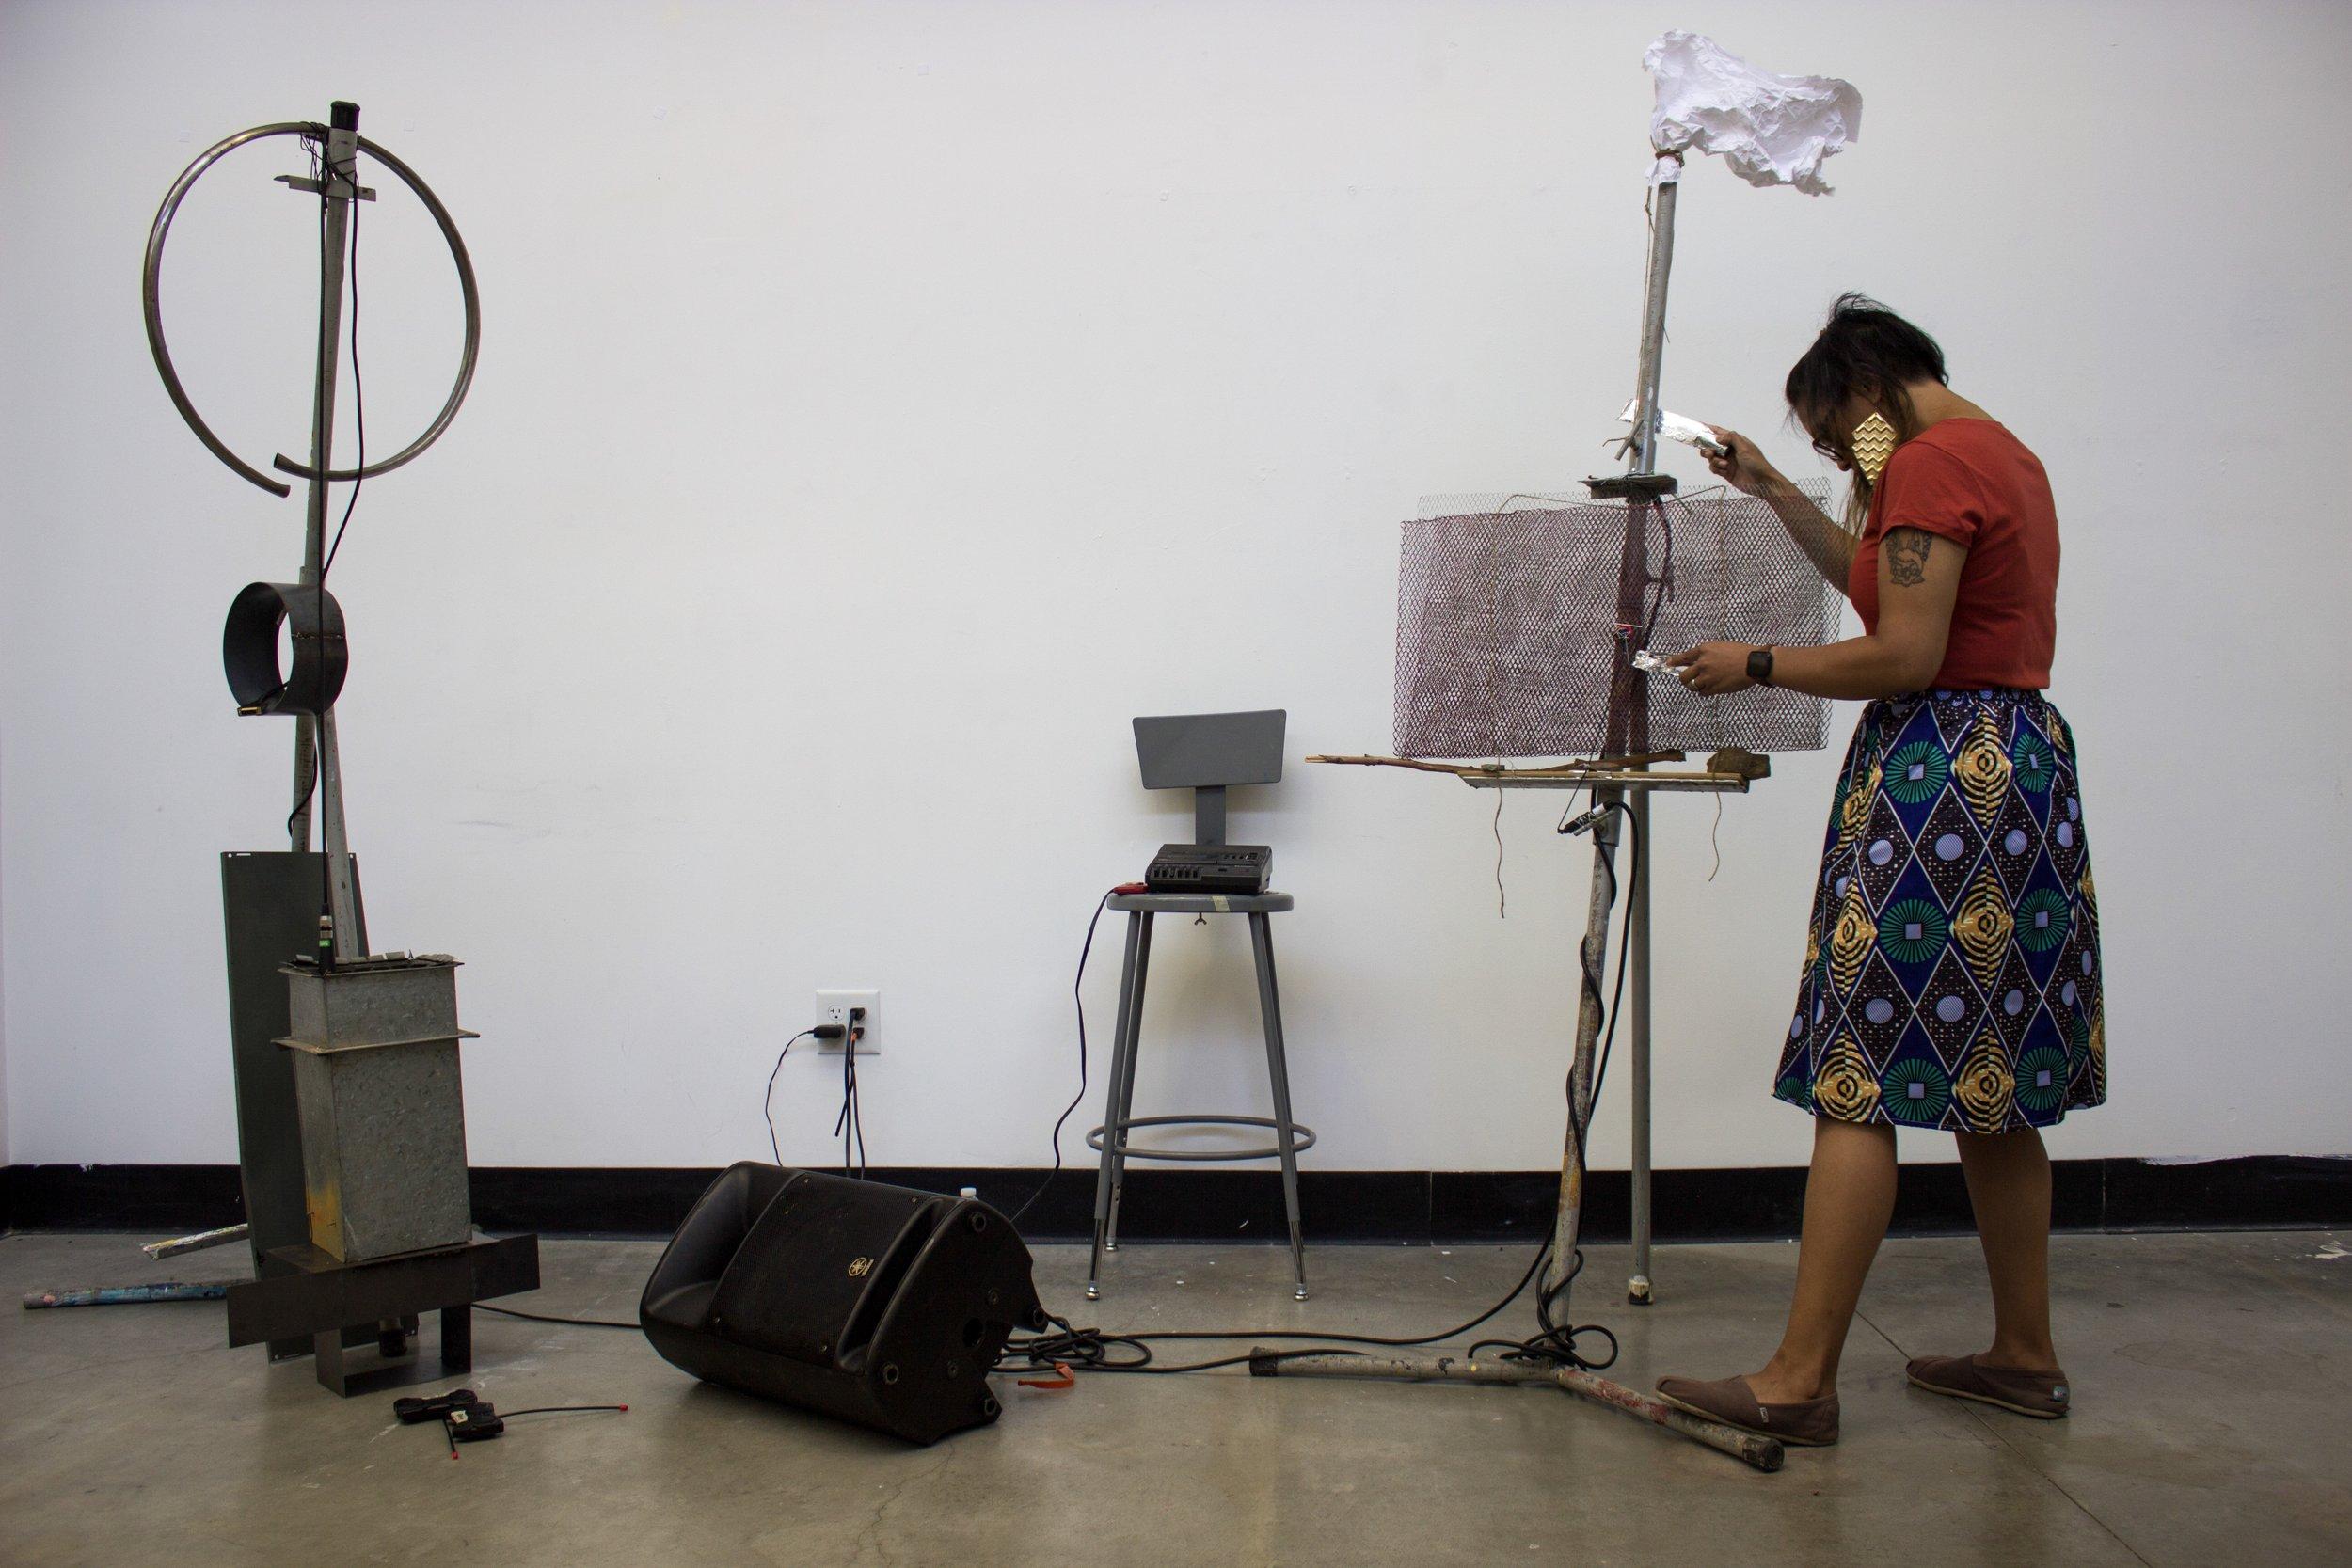 companion sound sculpture performance (2019) at CalArts